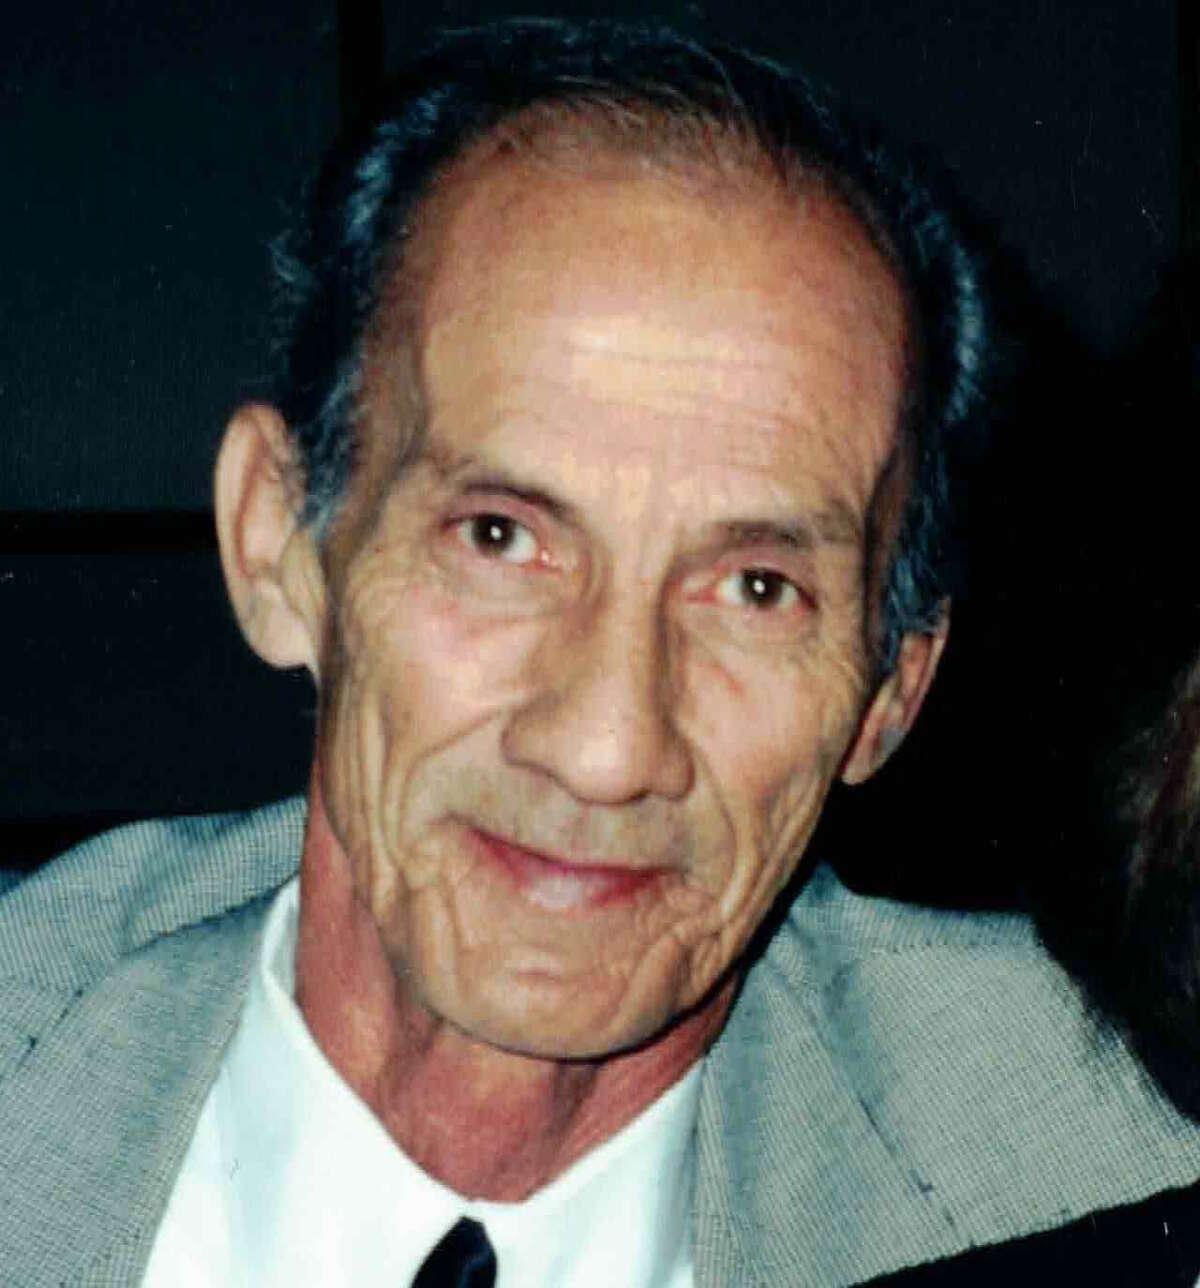 Alberto Raul Lozano